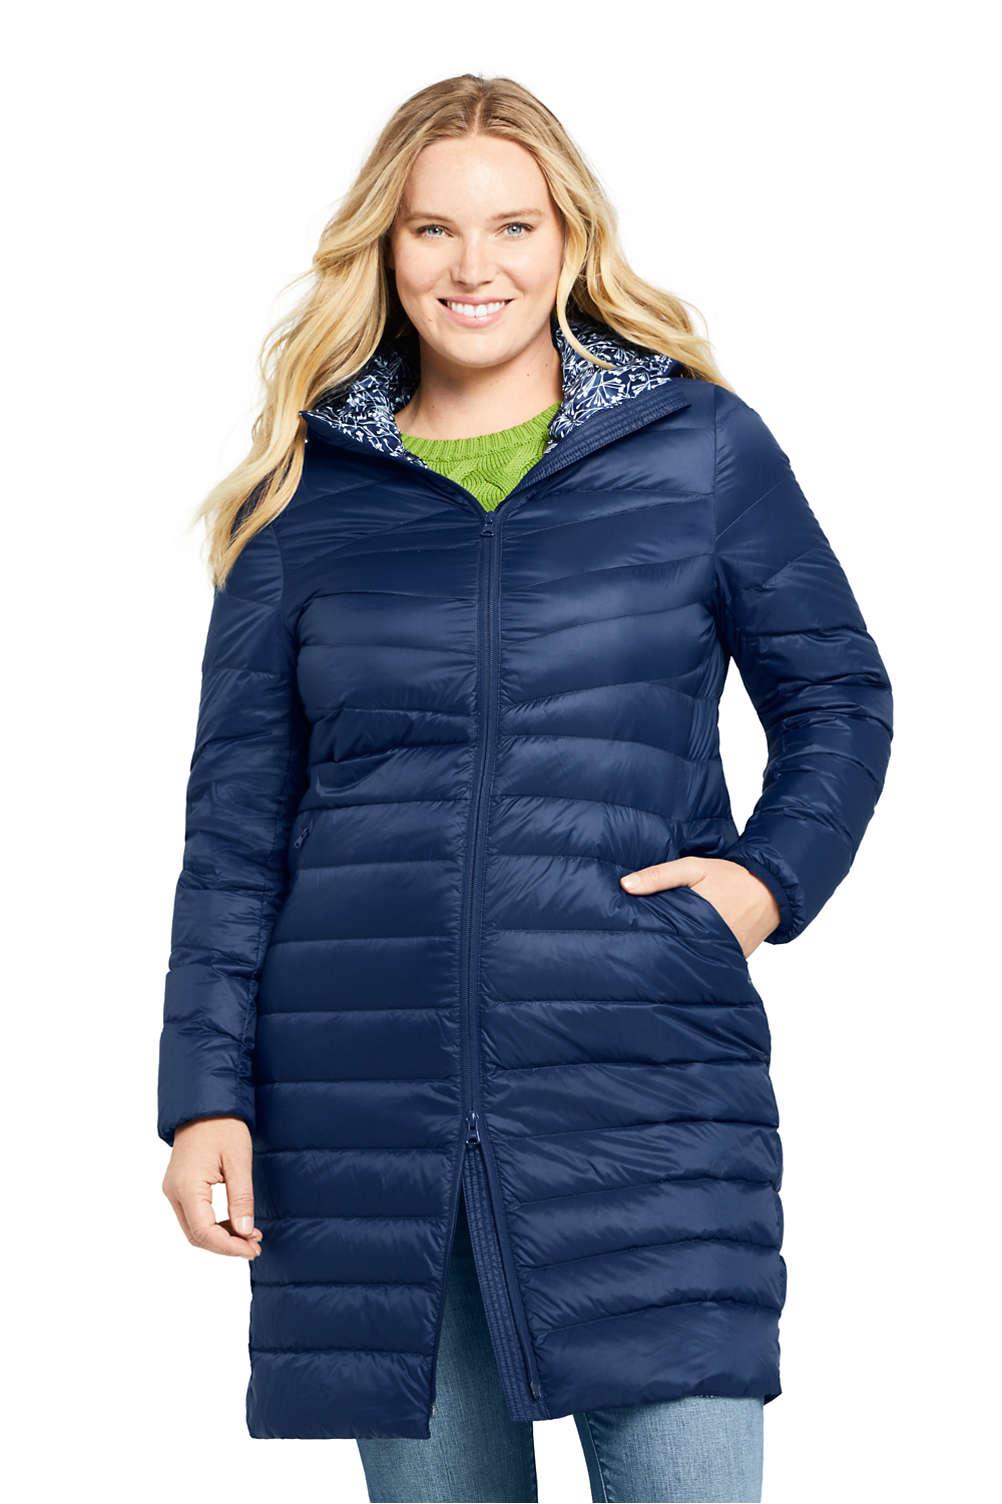 e0c9af36141 Women's Plus Size Ultralight Packable Long Down Coat from Lands' End